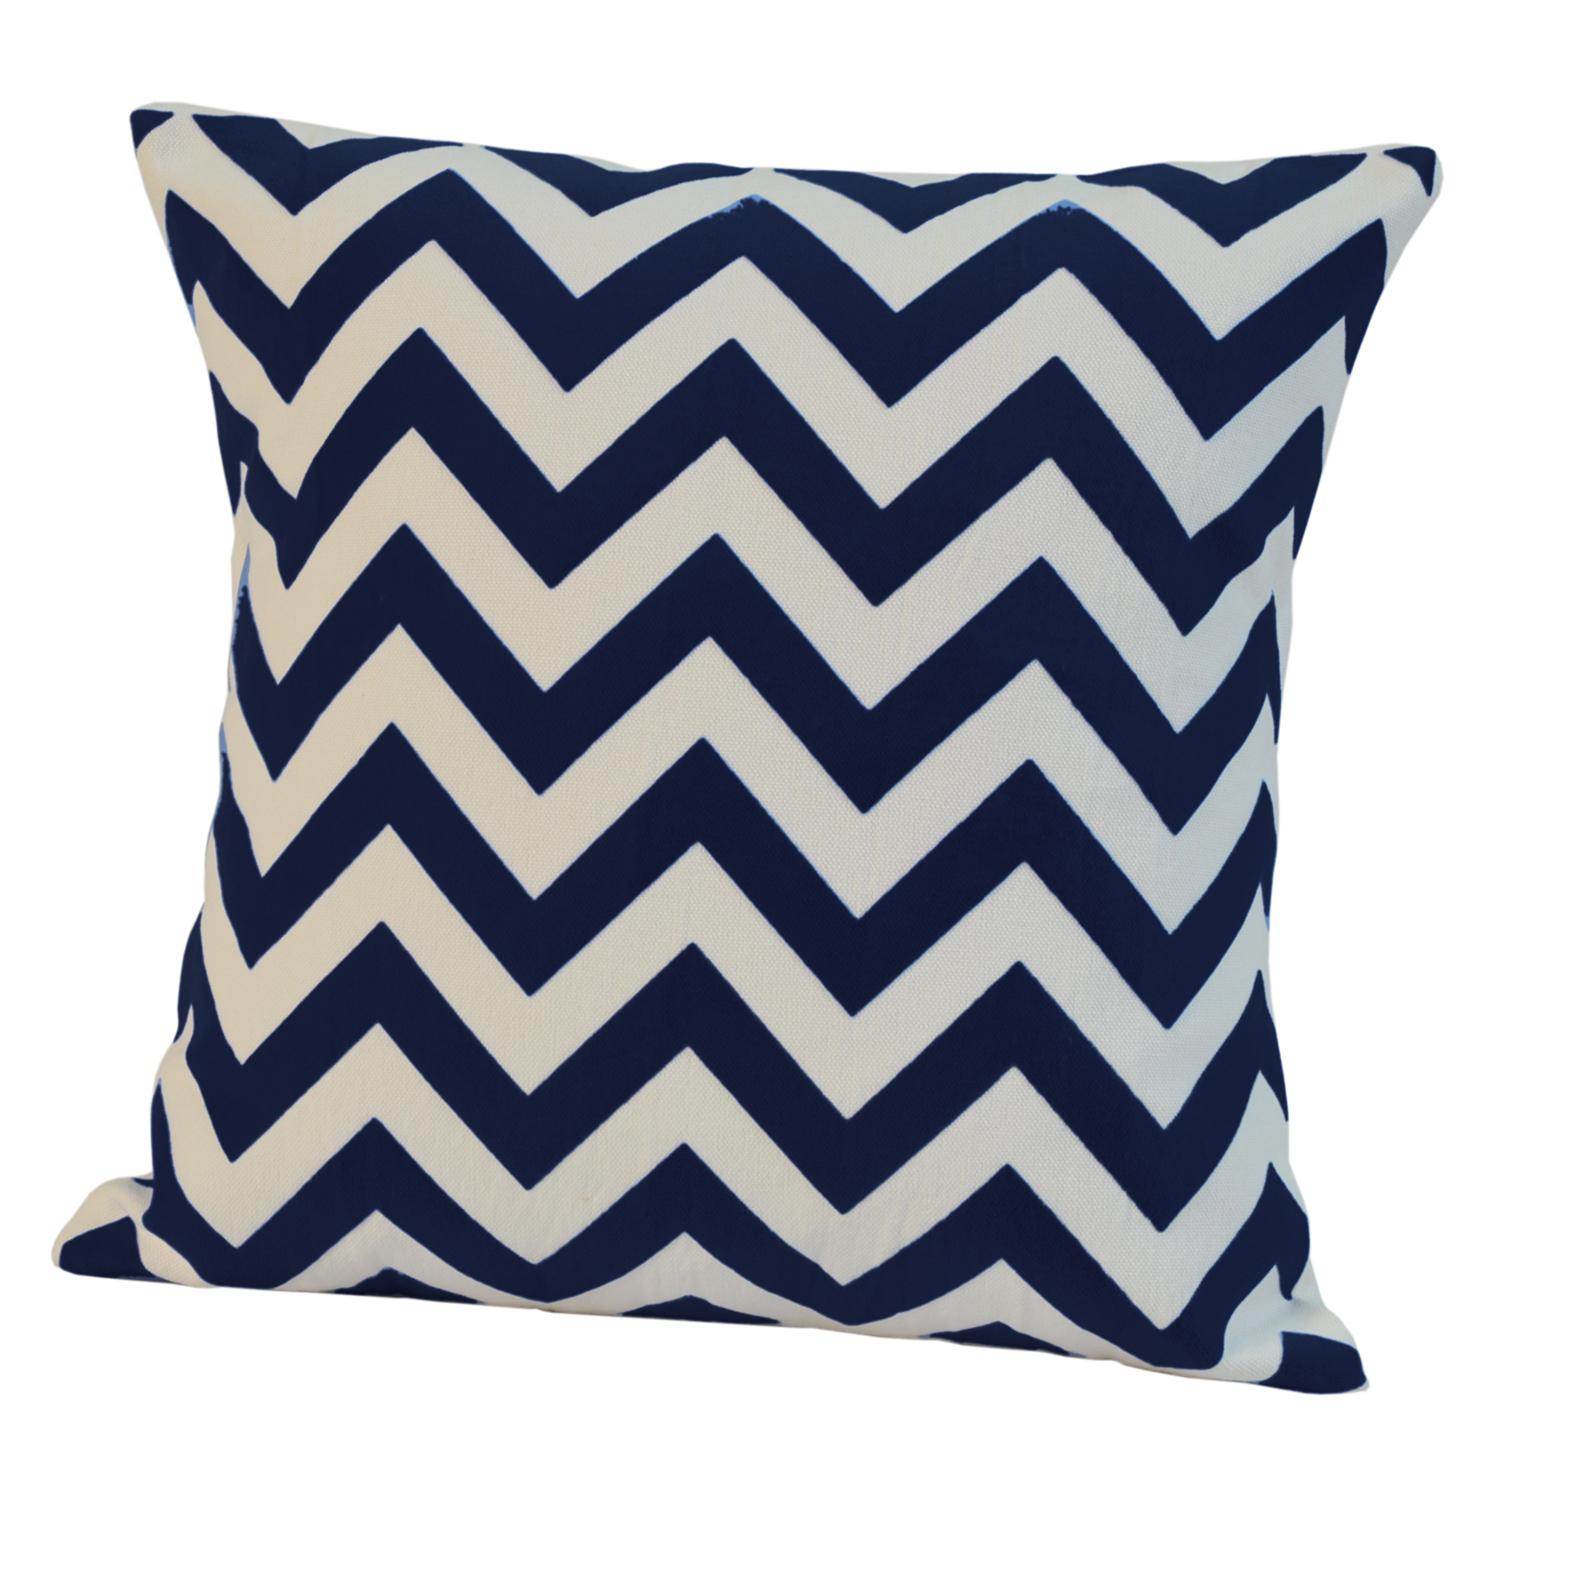 Элитная подушка декоративная Chevron темно-синяя от Casual Avenue